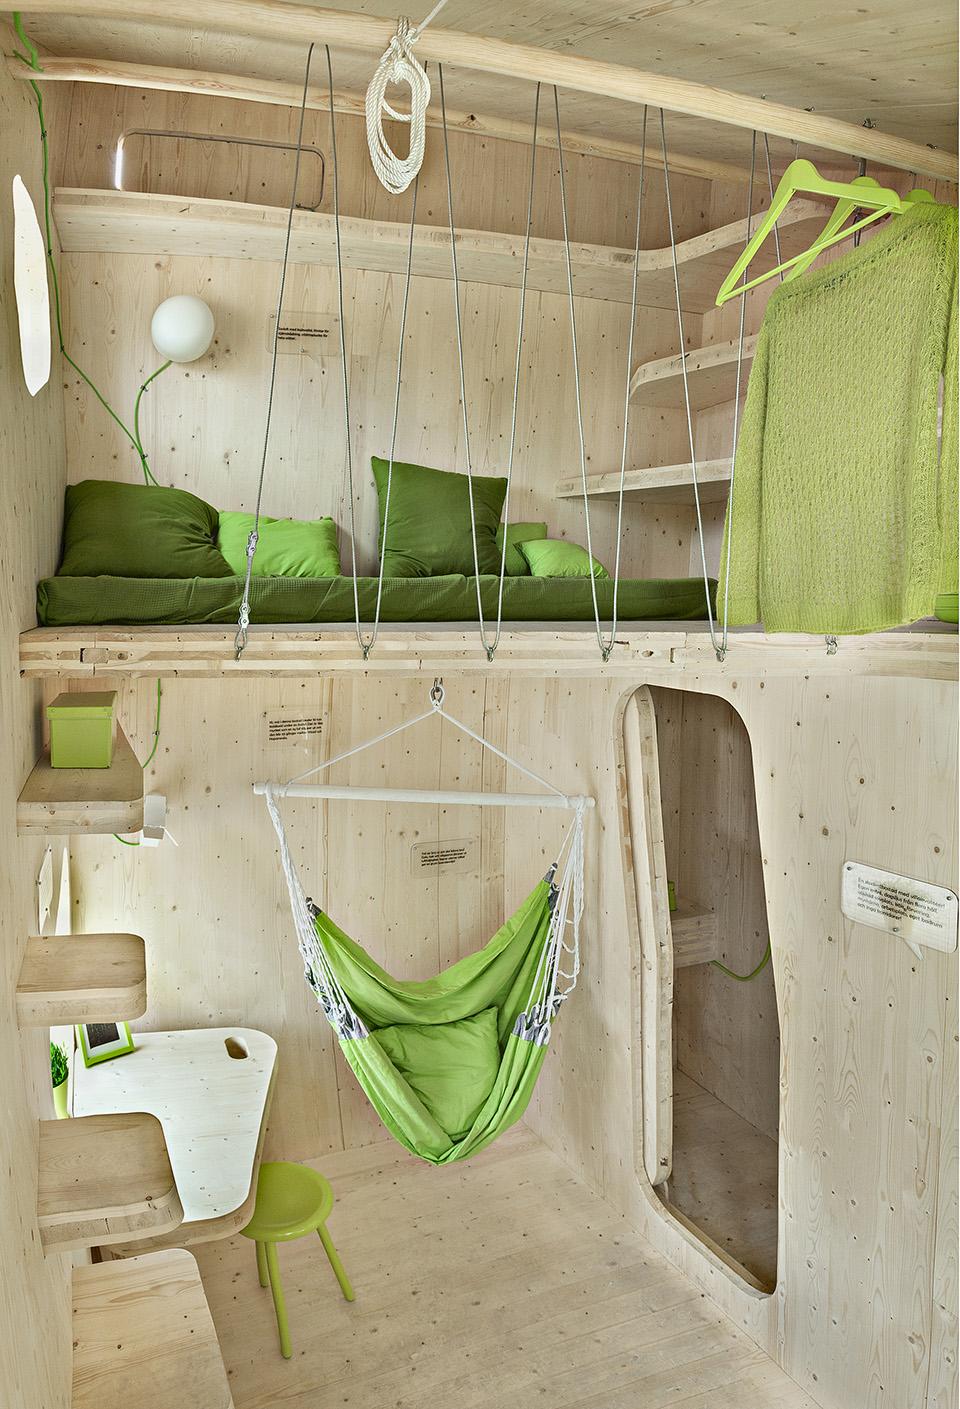 Prefab Student House by Tengbom Architects 5